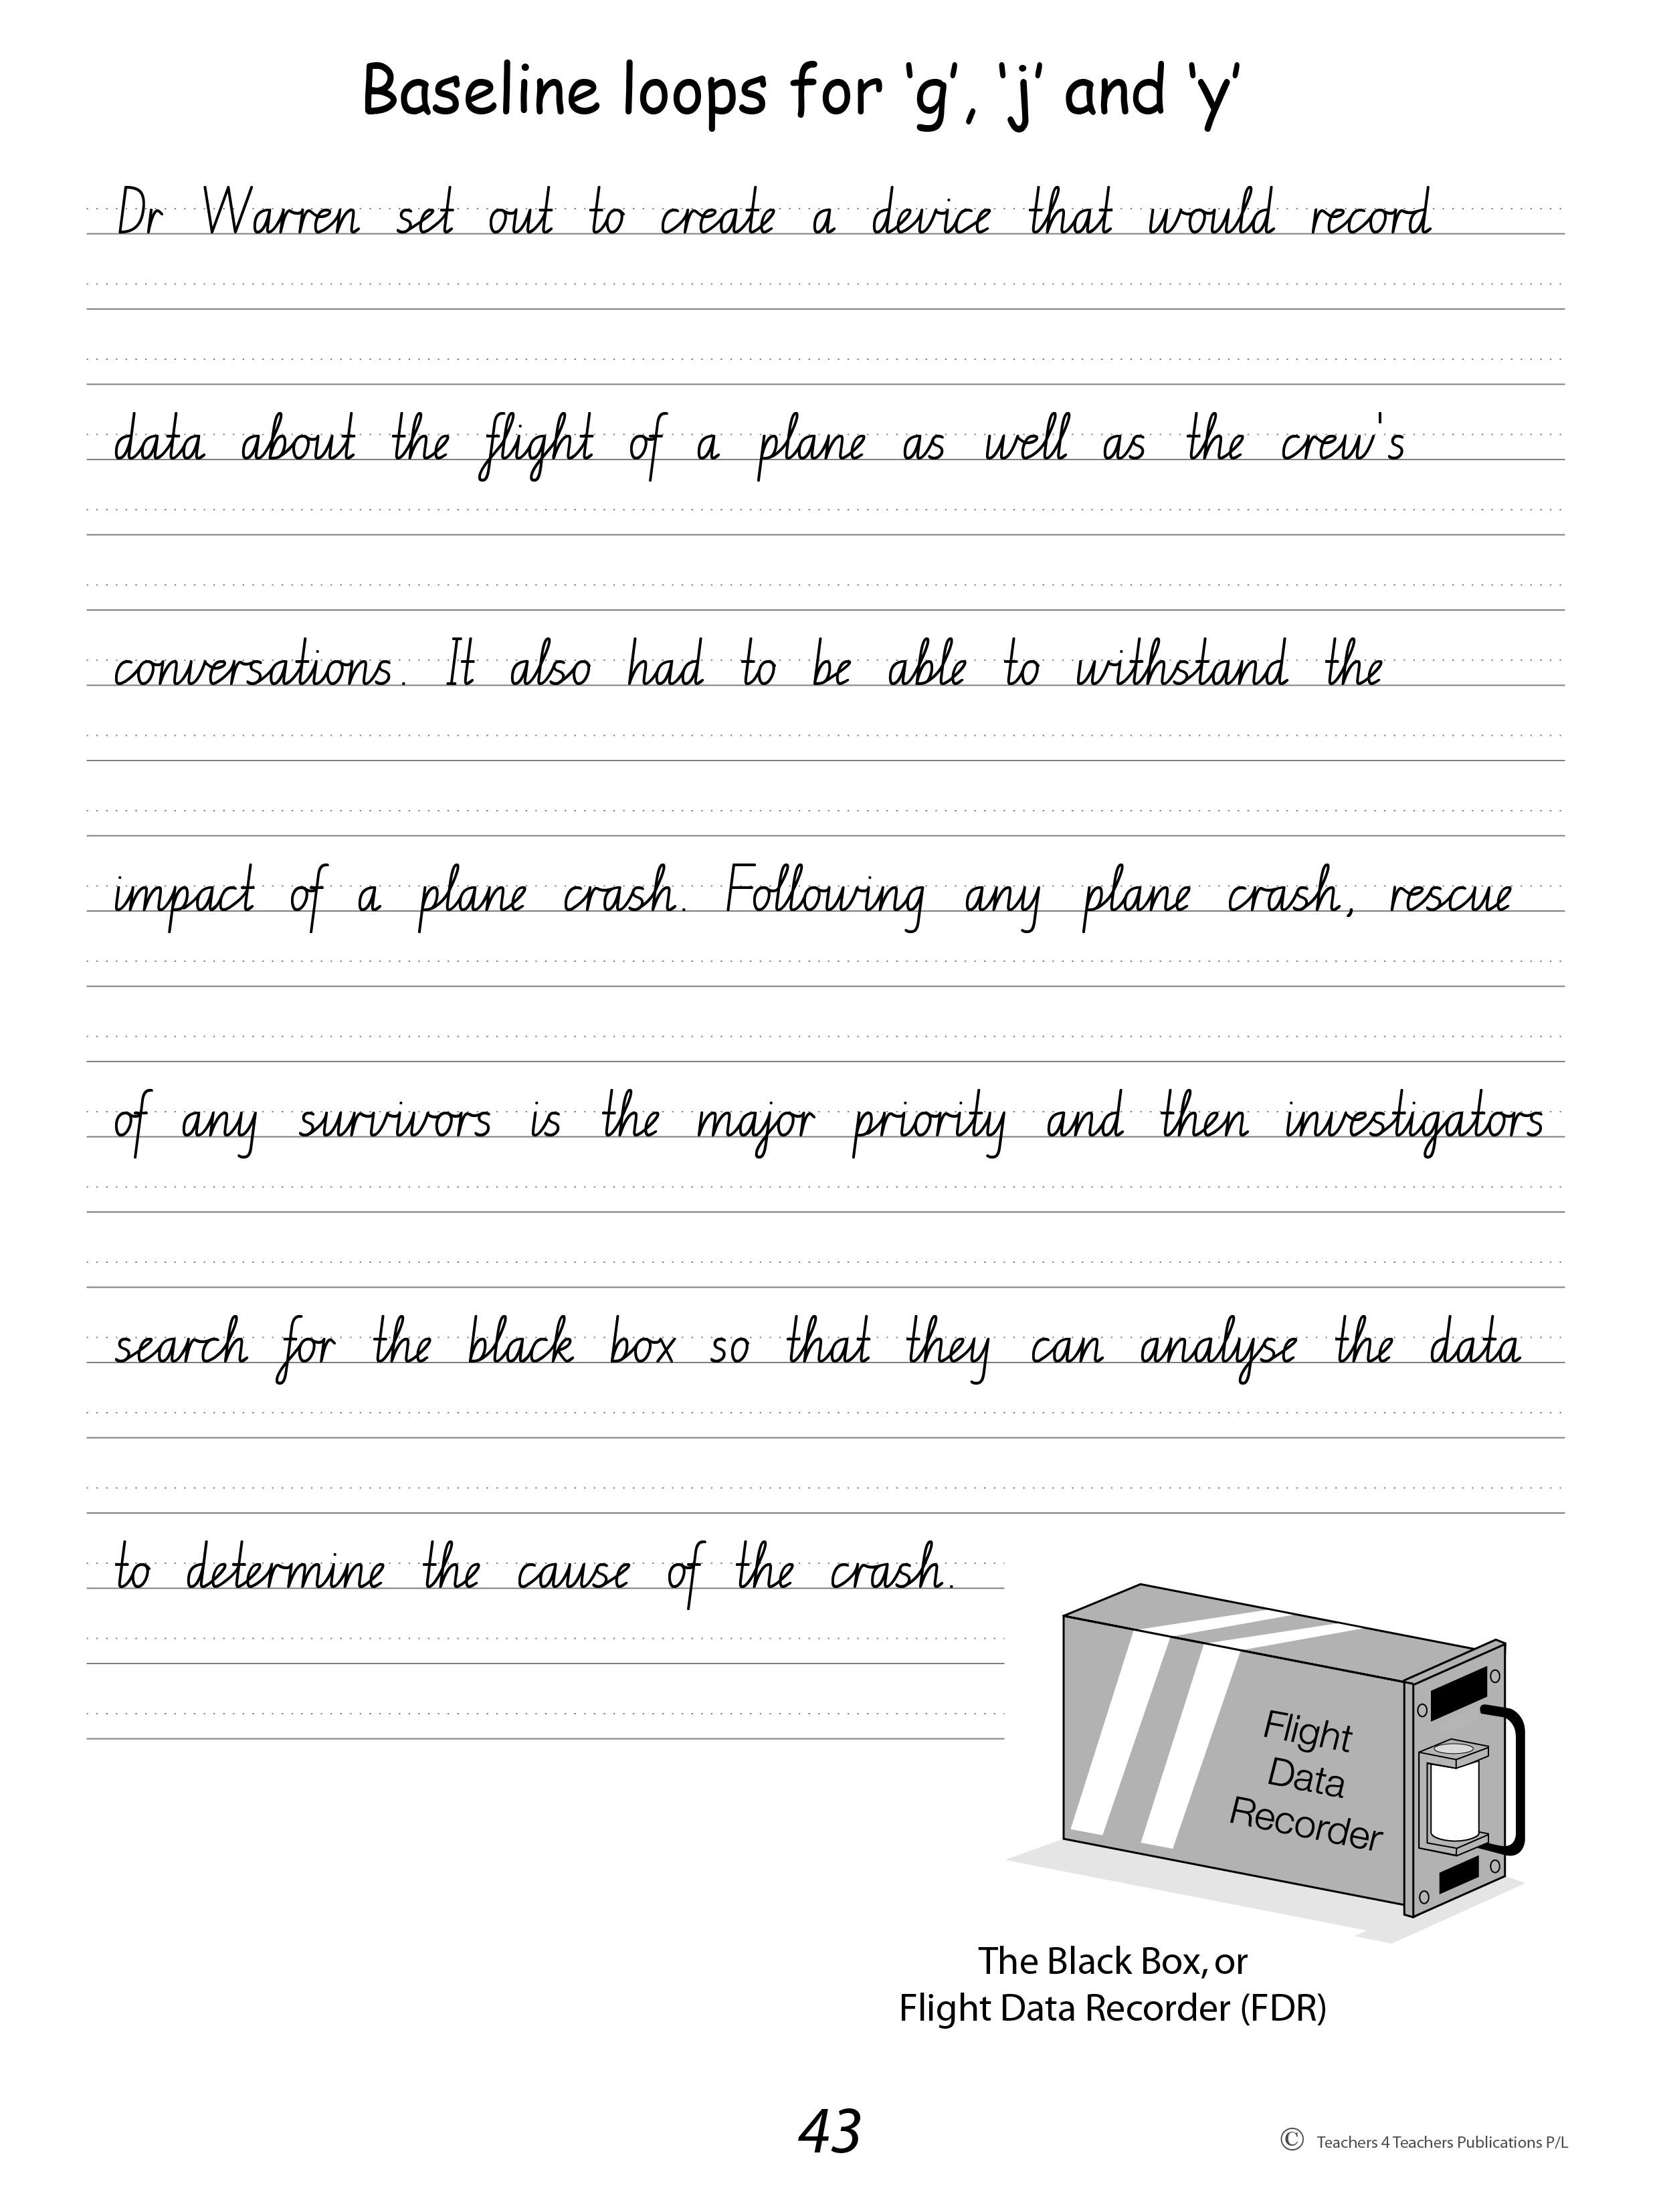 handwriting conventions new south wales teachers 4 teachers publications pty ltd. Black Bedroom Furniture Sets. Home Design Ideas